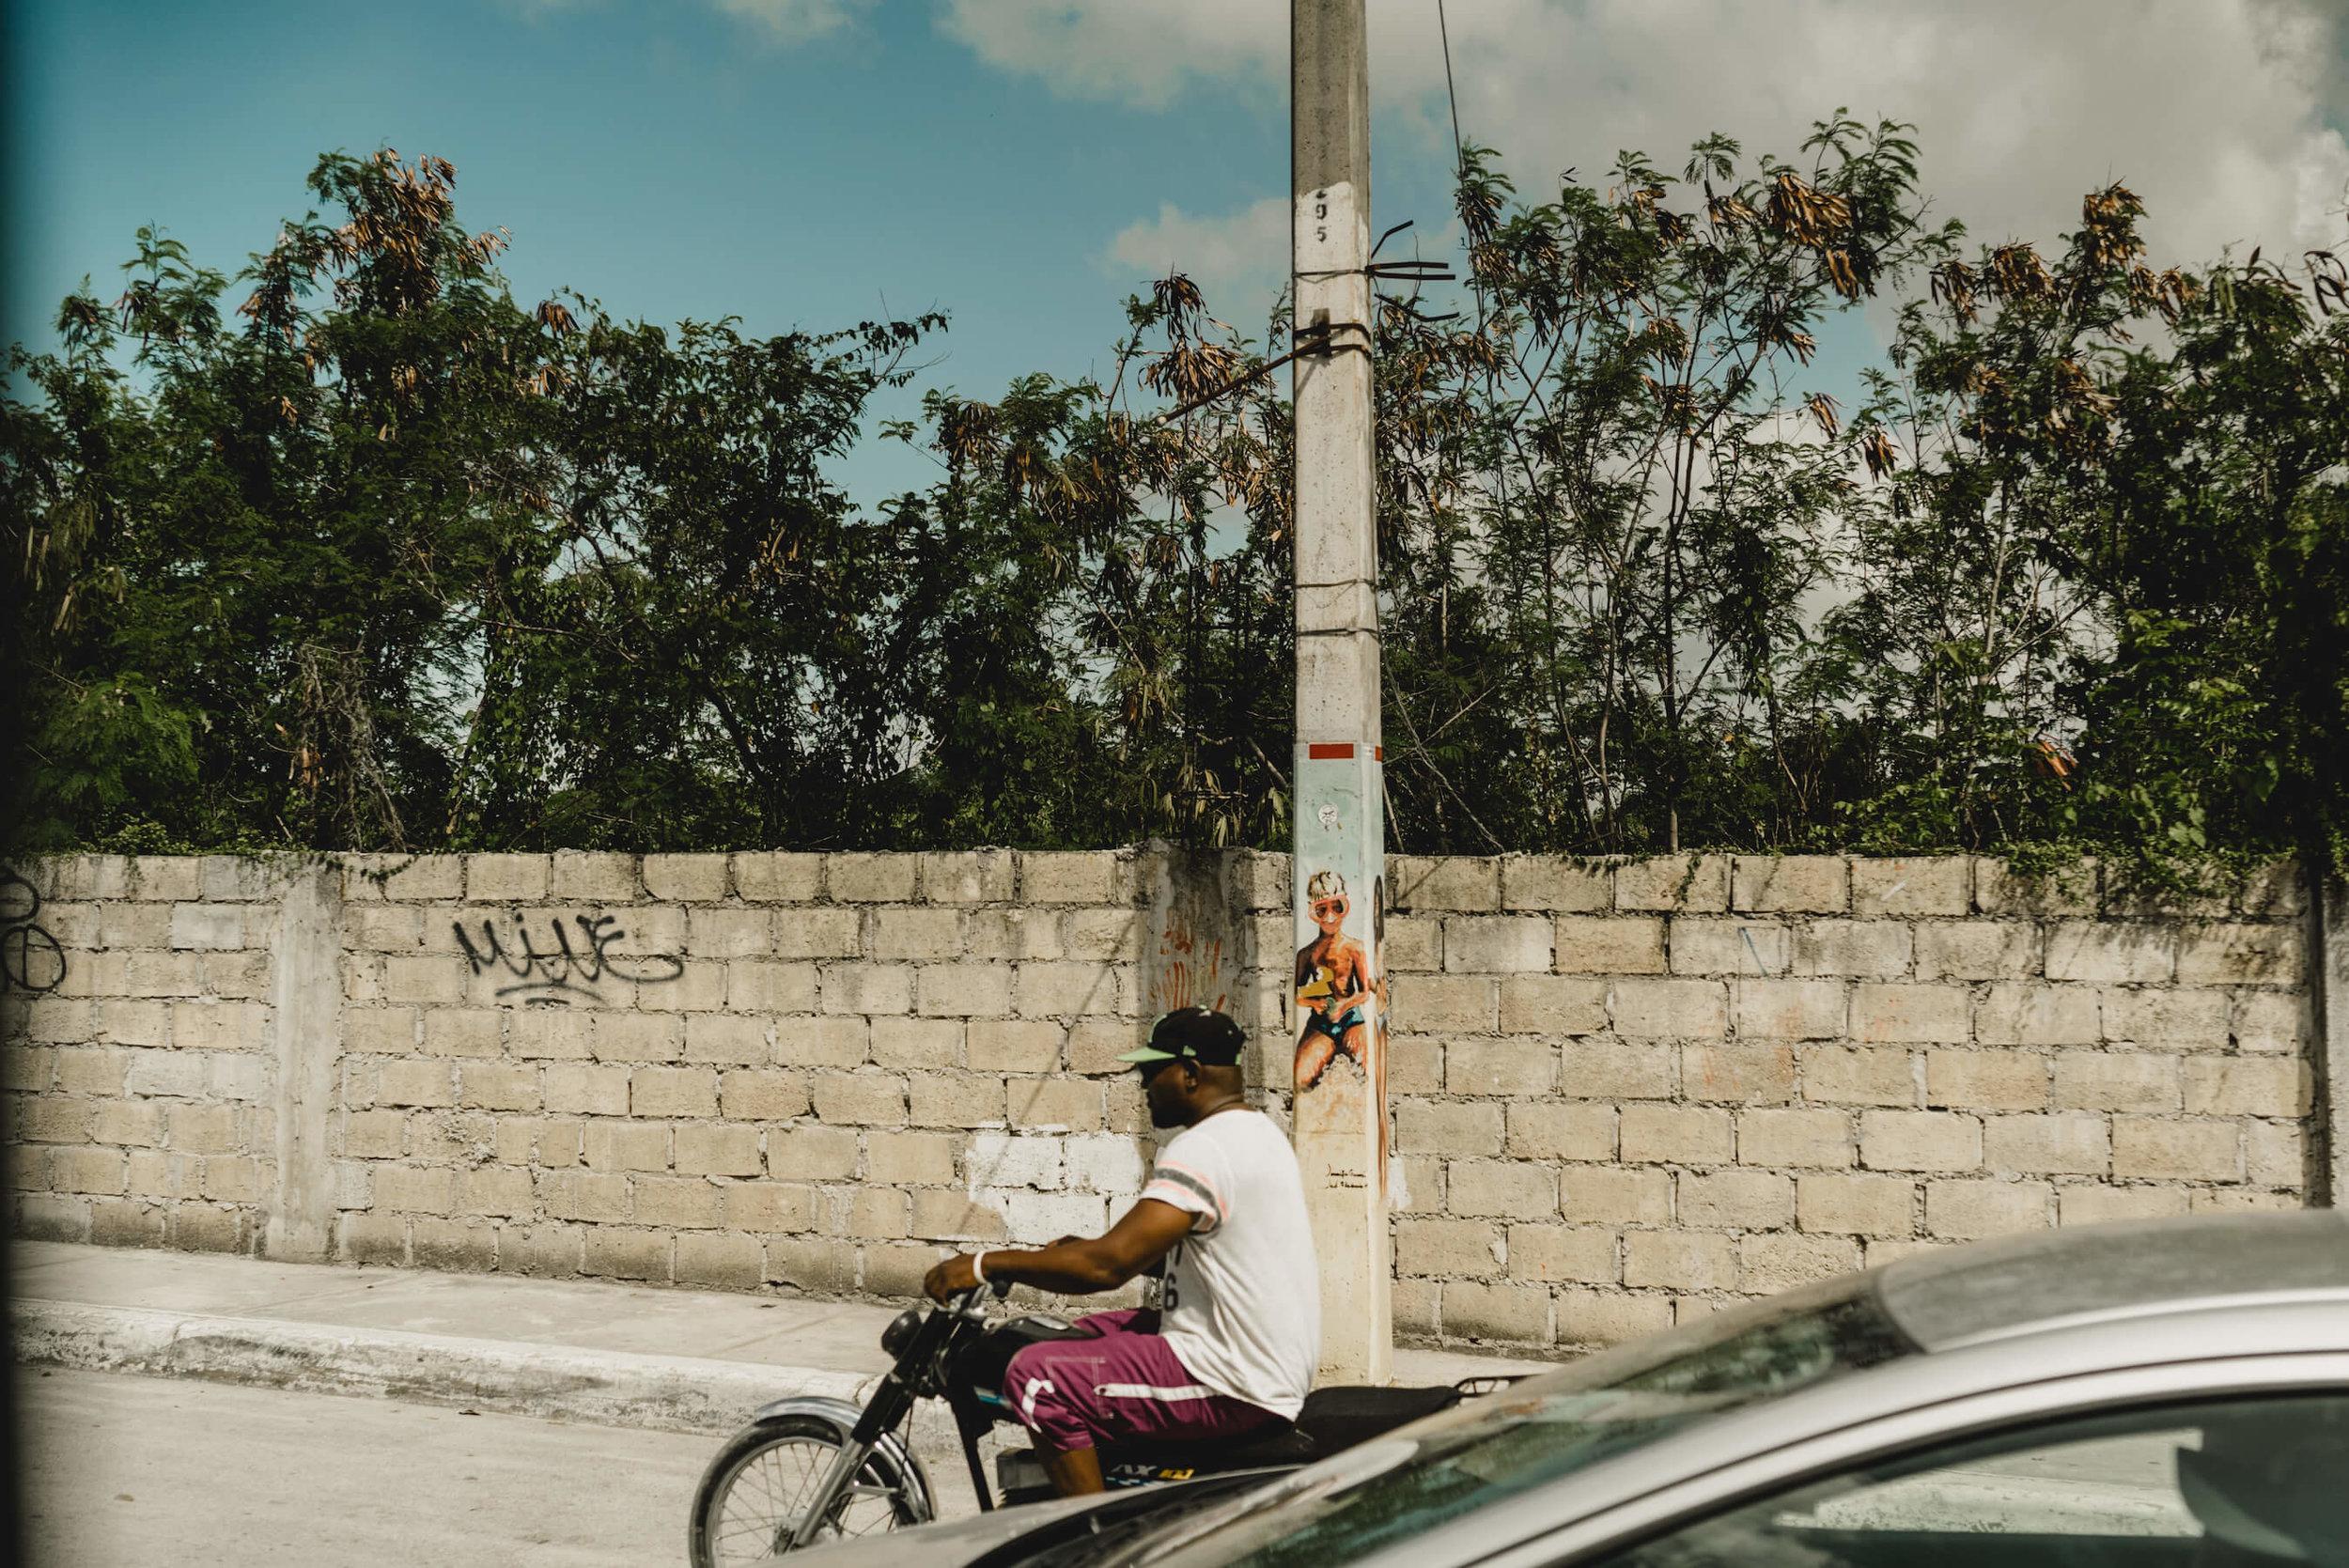 engle-olson-punta-cana-dominican-republic-2.jpg